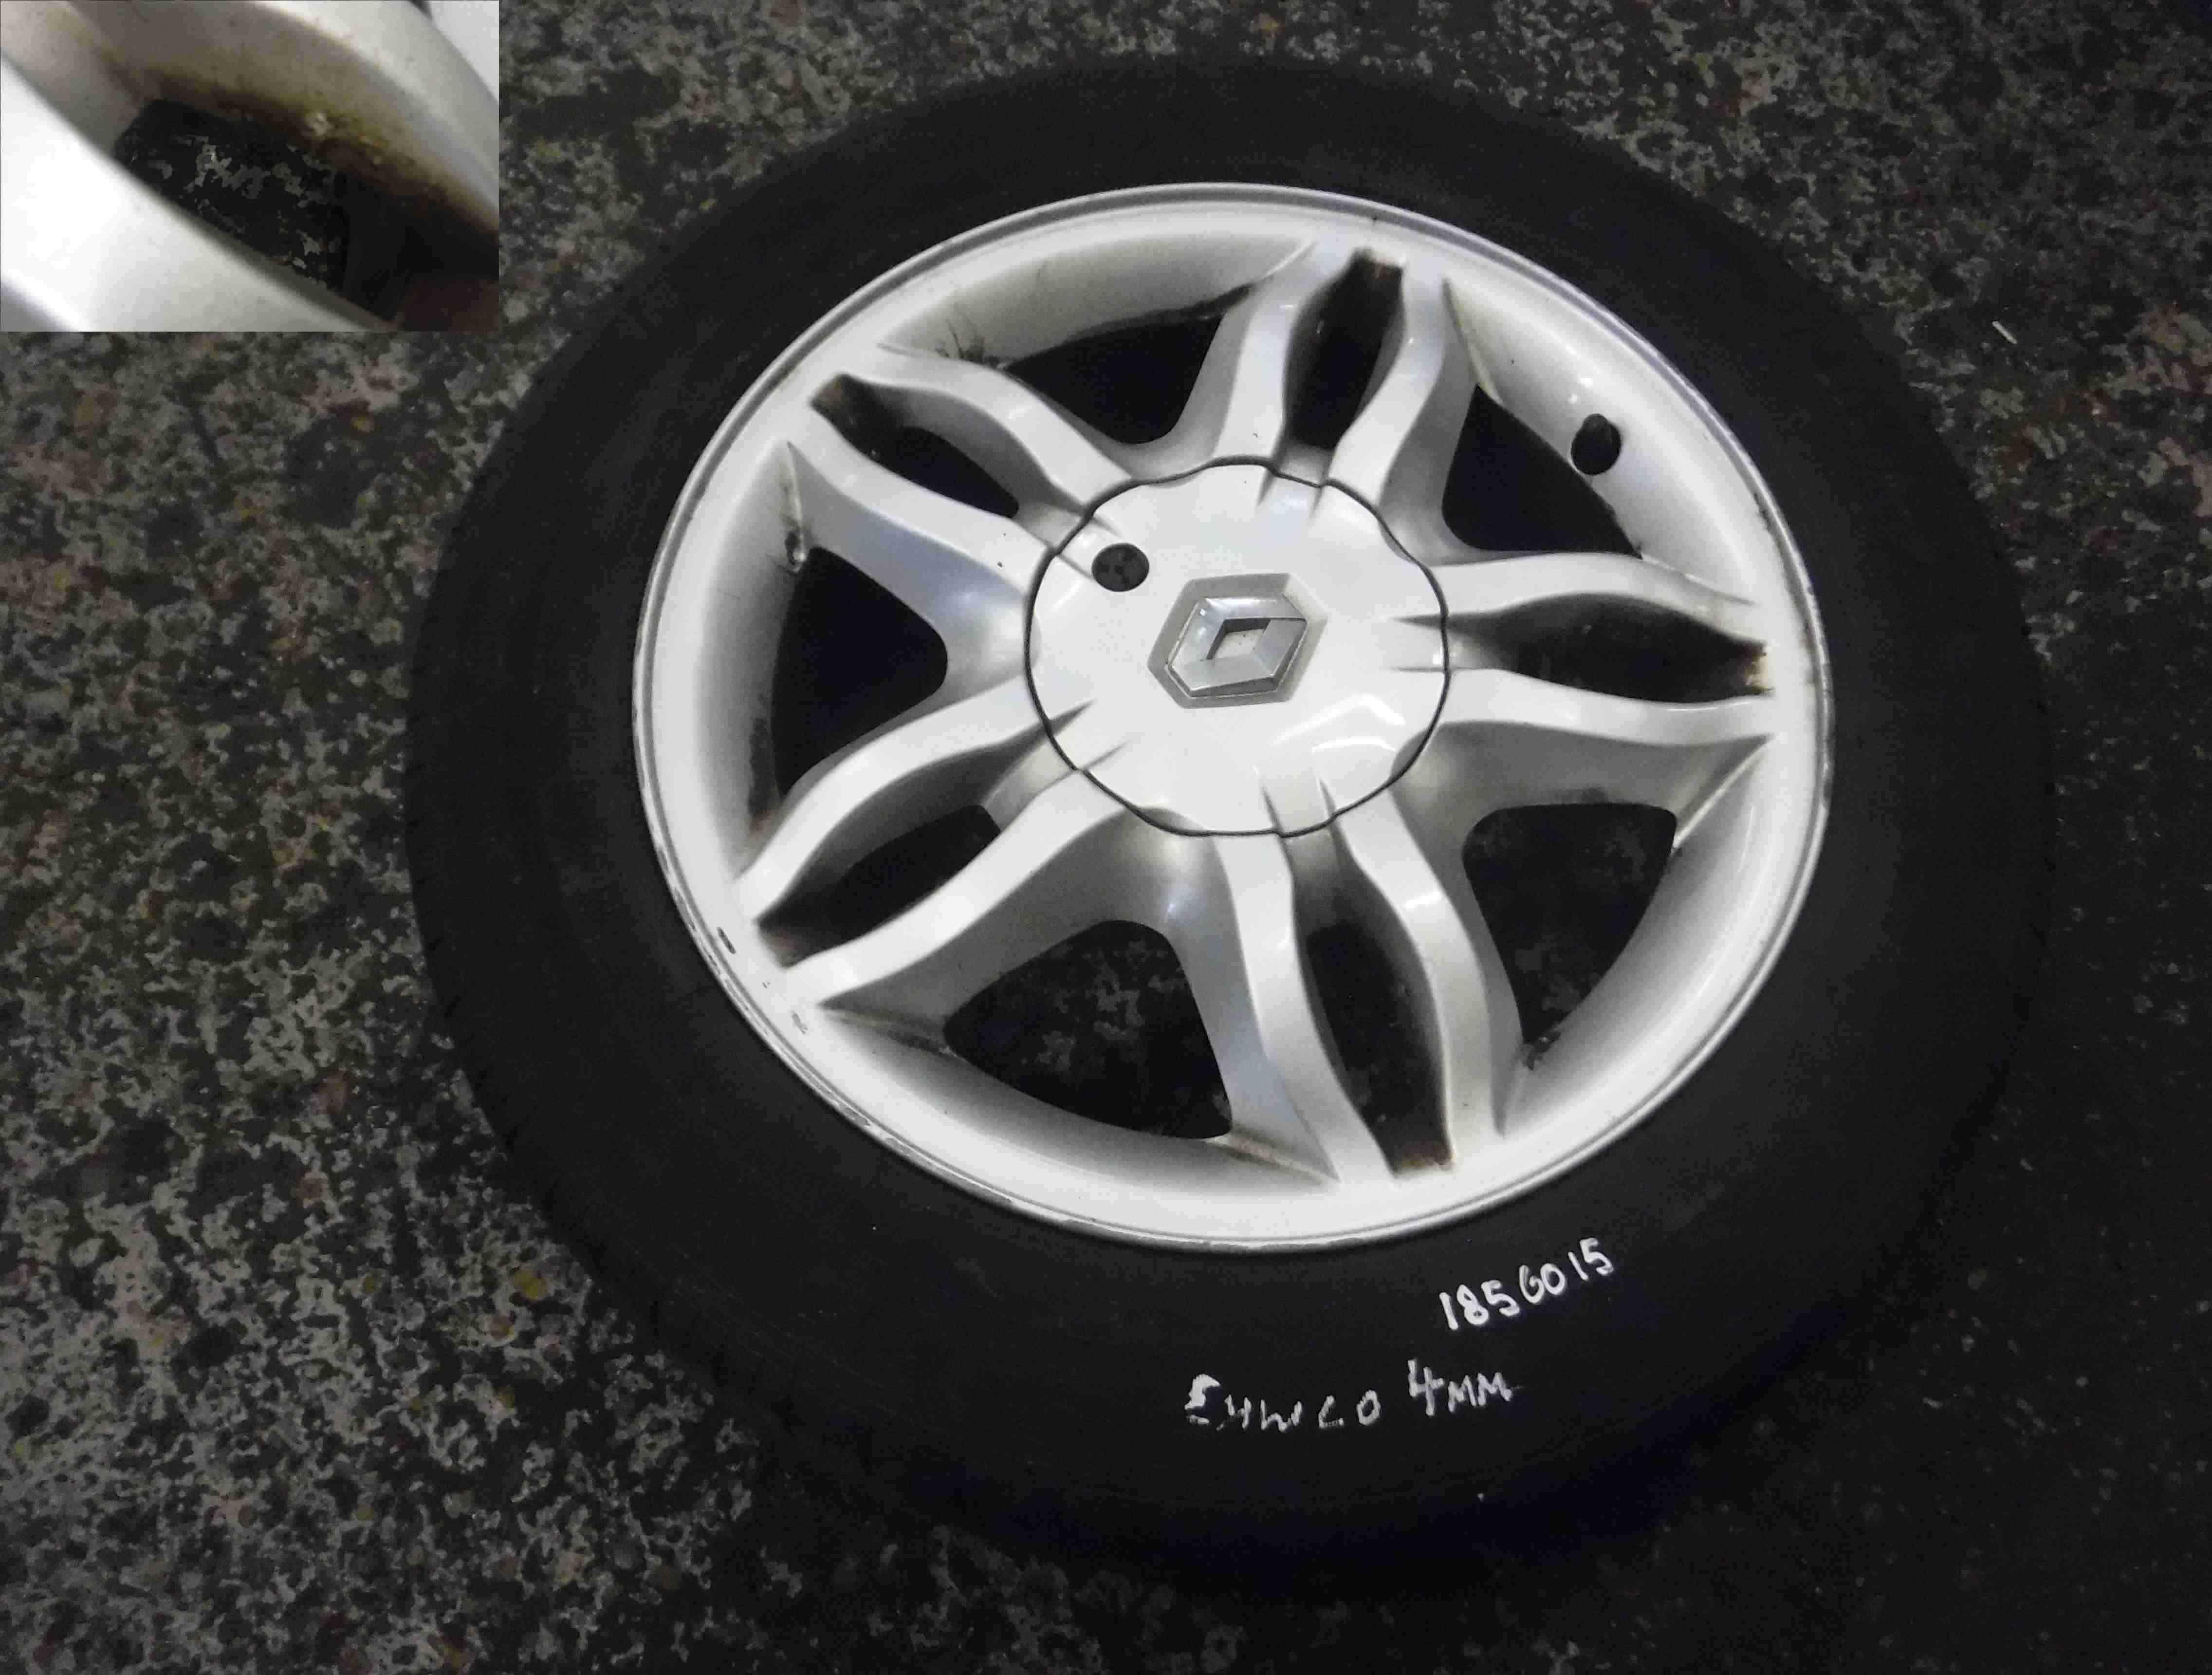 Renault Clio MK3 2005-2009 Mahonia Alloy Wheel  Tyre 185 60 15 4mm Tread 35